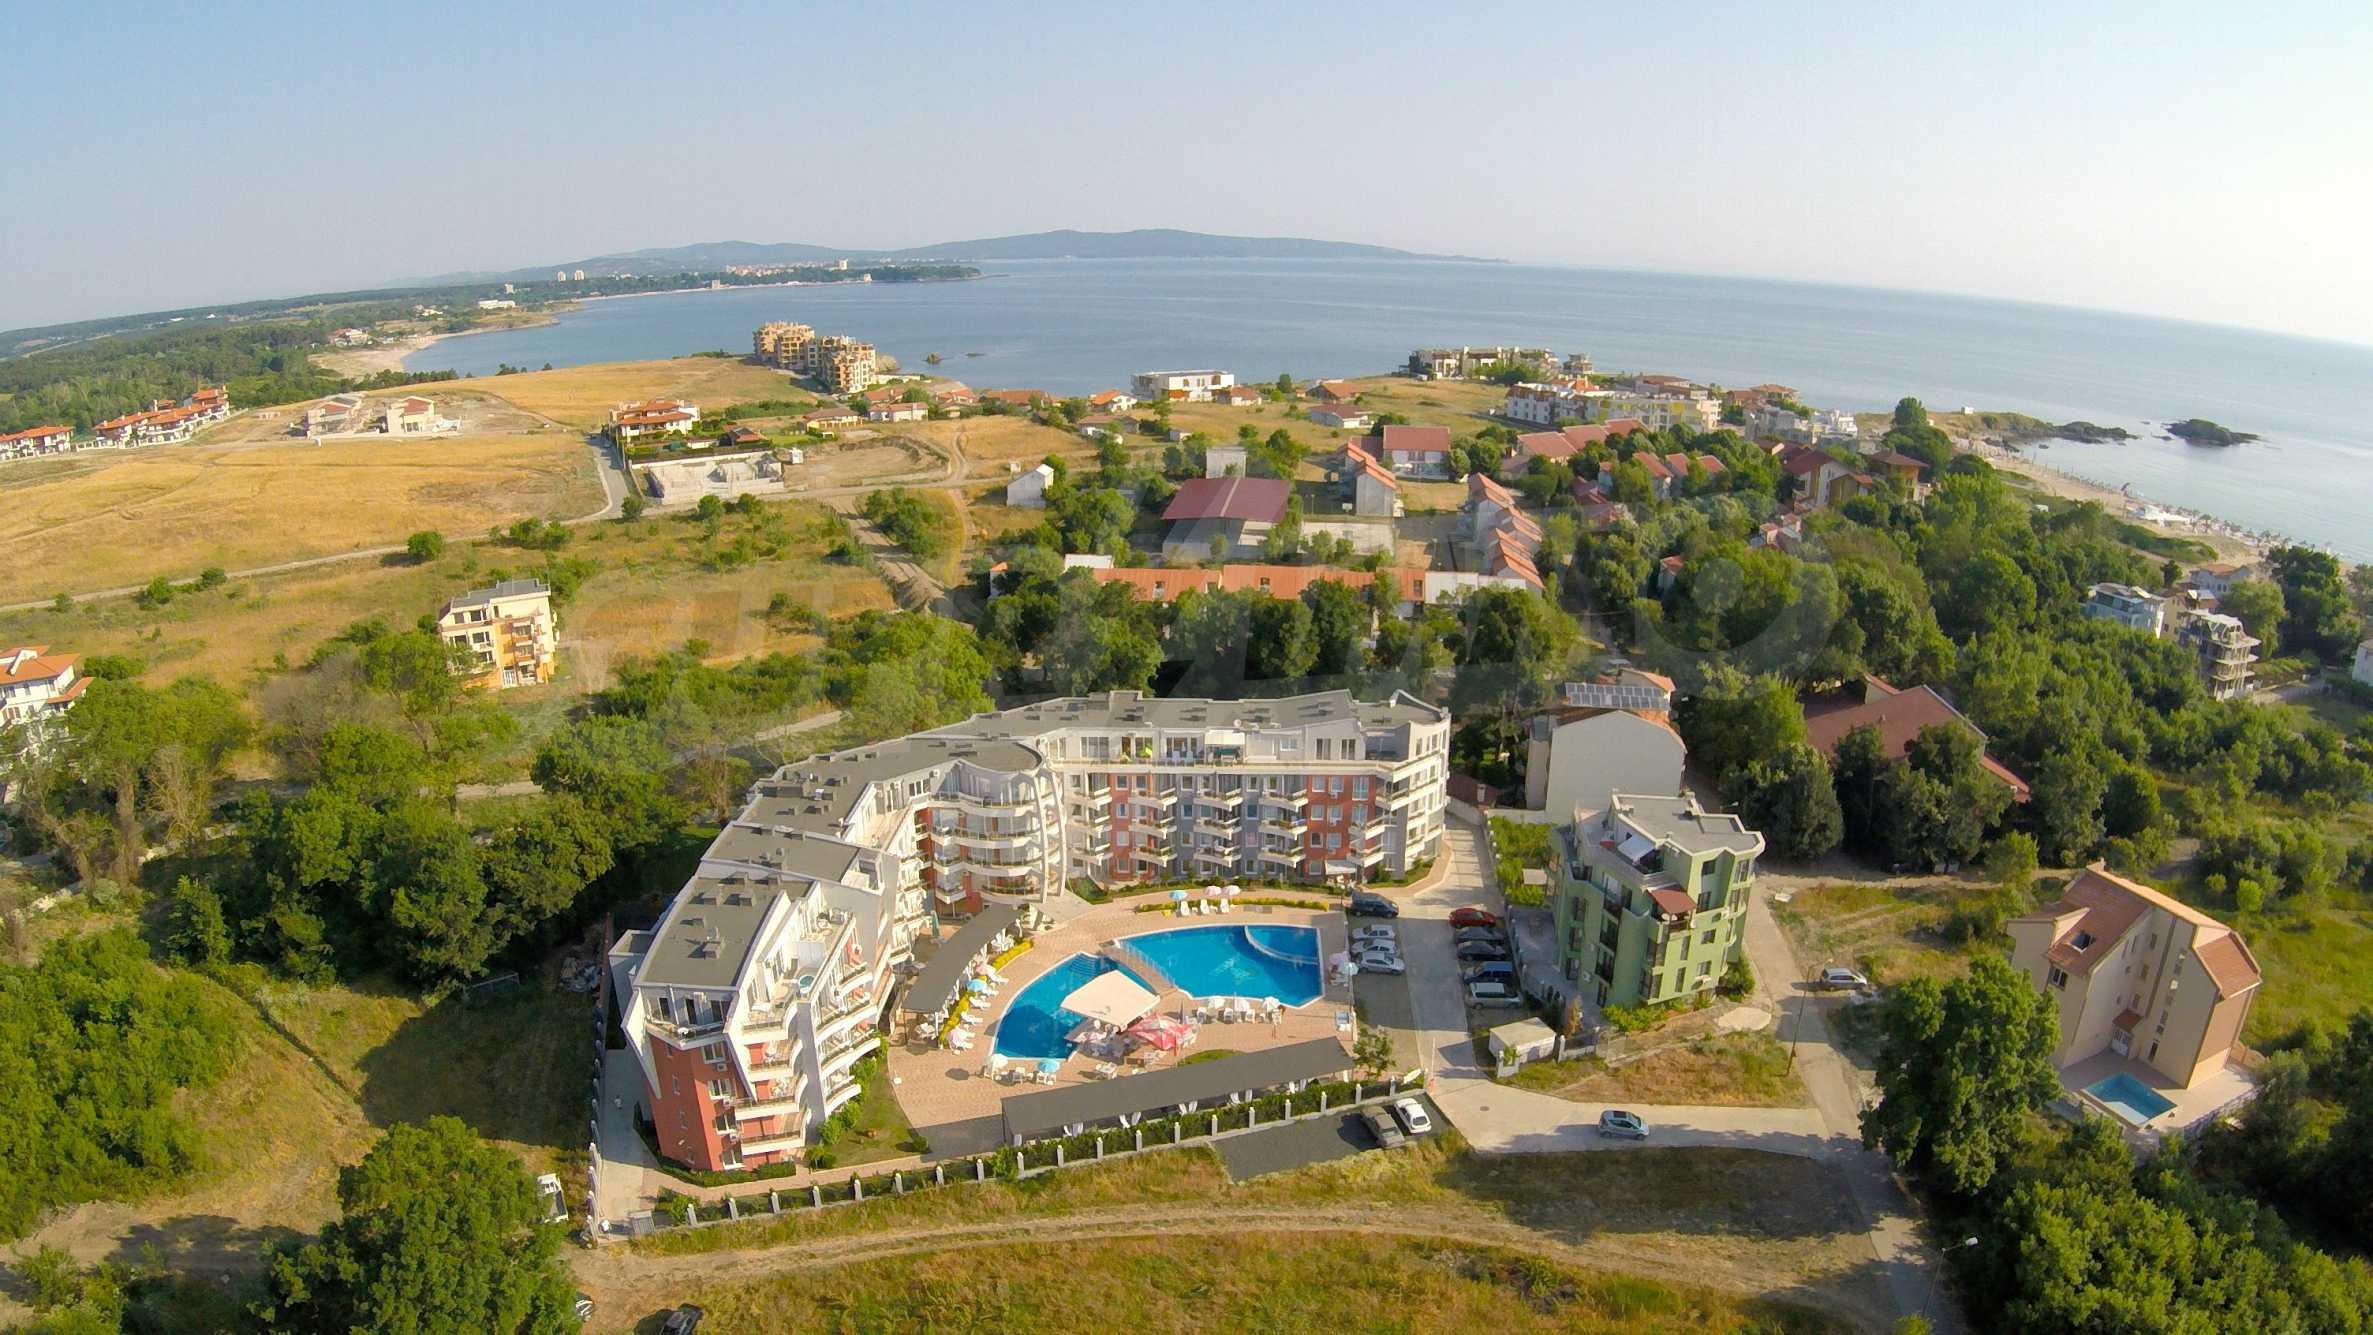 Трехкомнатный апартамент на продажу в комплексе Emberli в курорте Лозенец 26